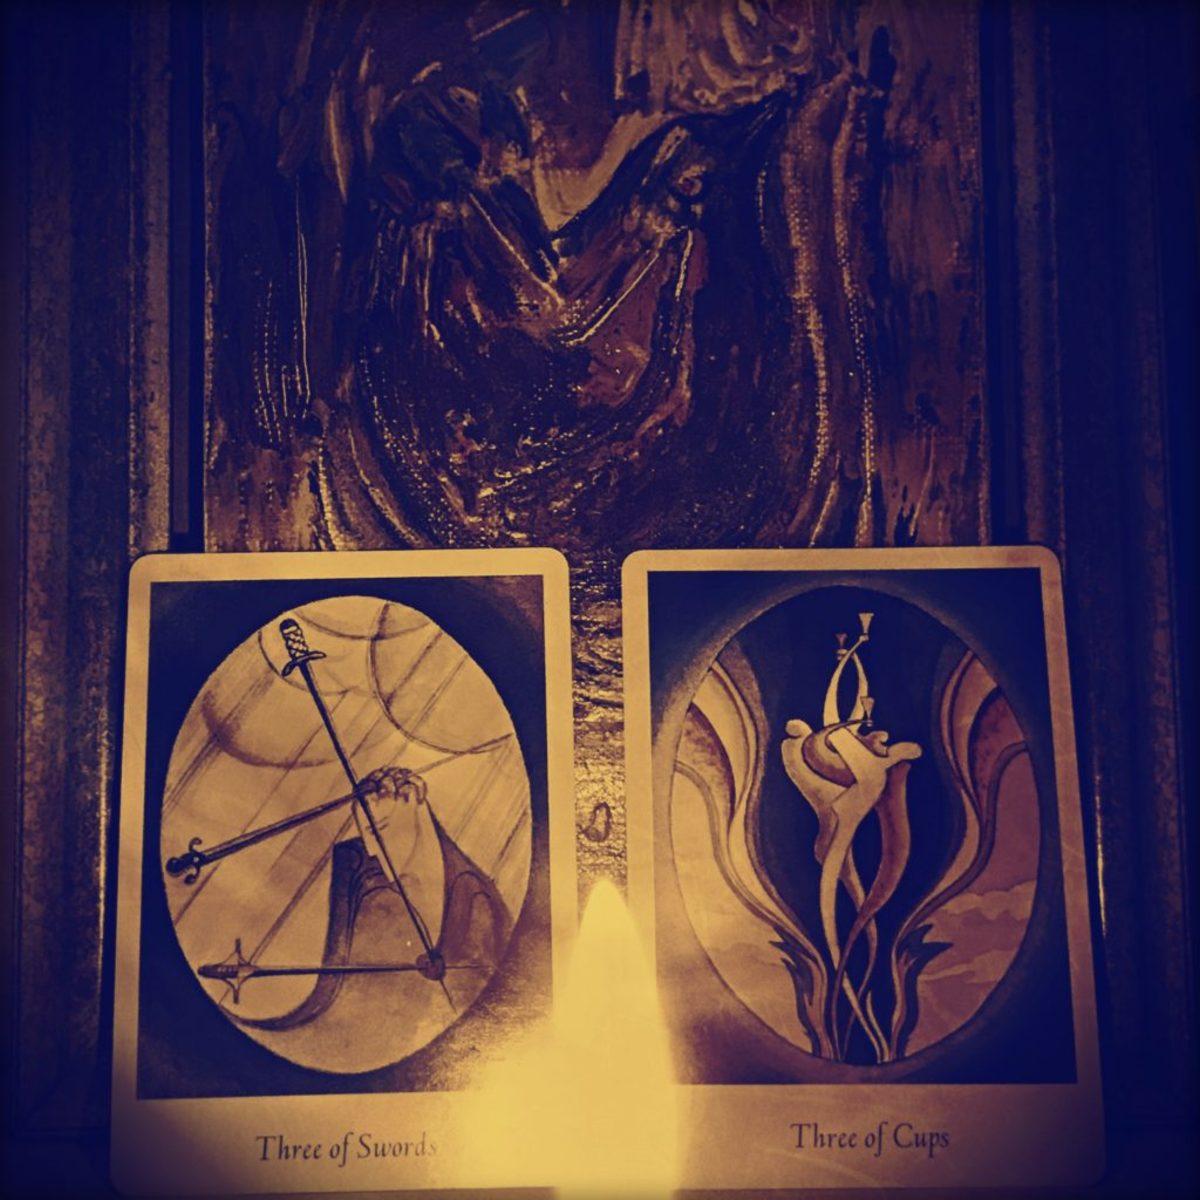 tarot-a-glance-at-the-historic-origins-of-a-misunderstood-practice